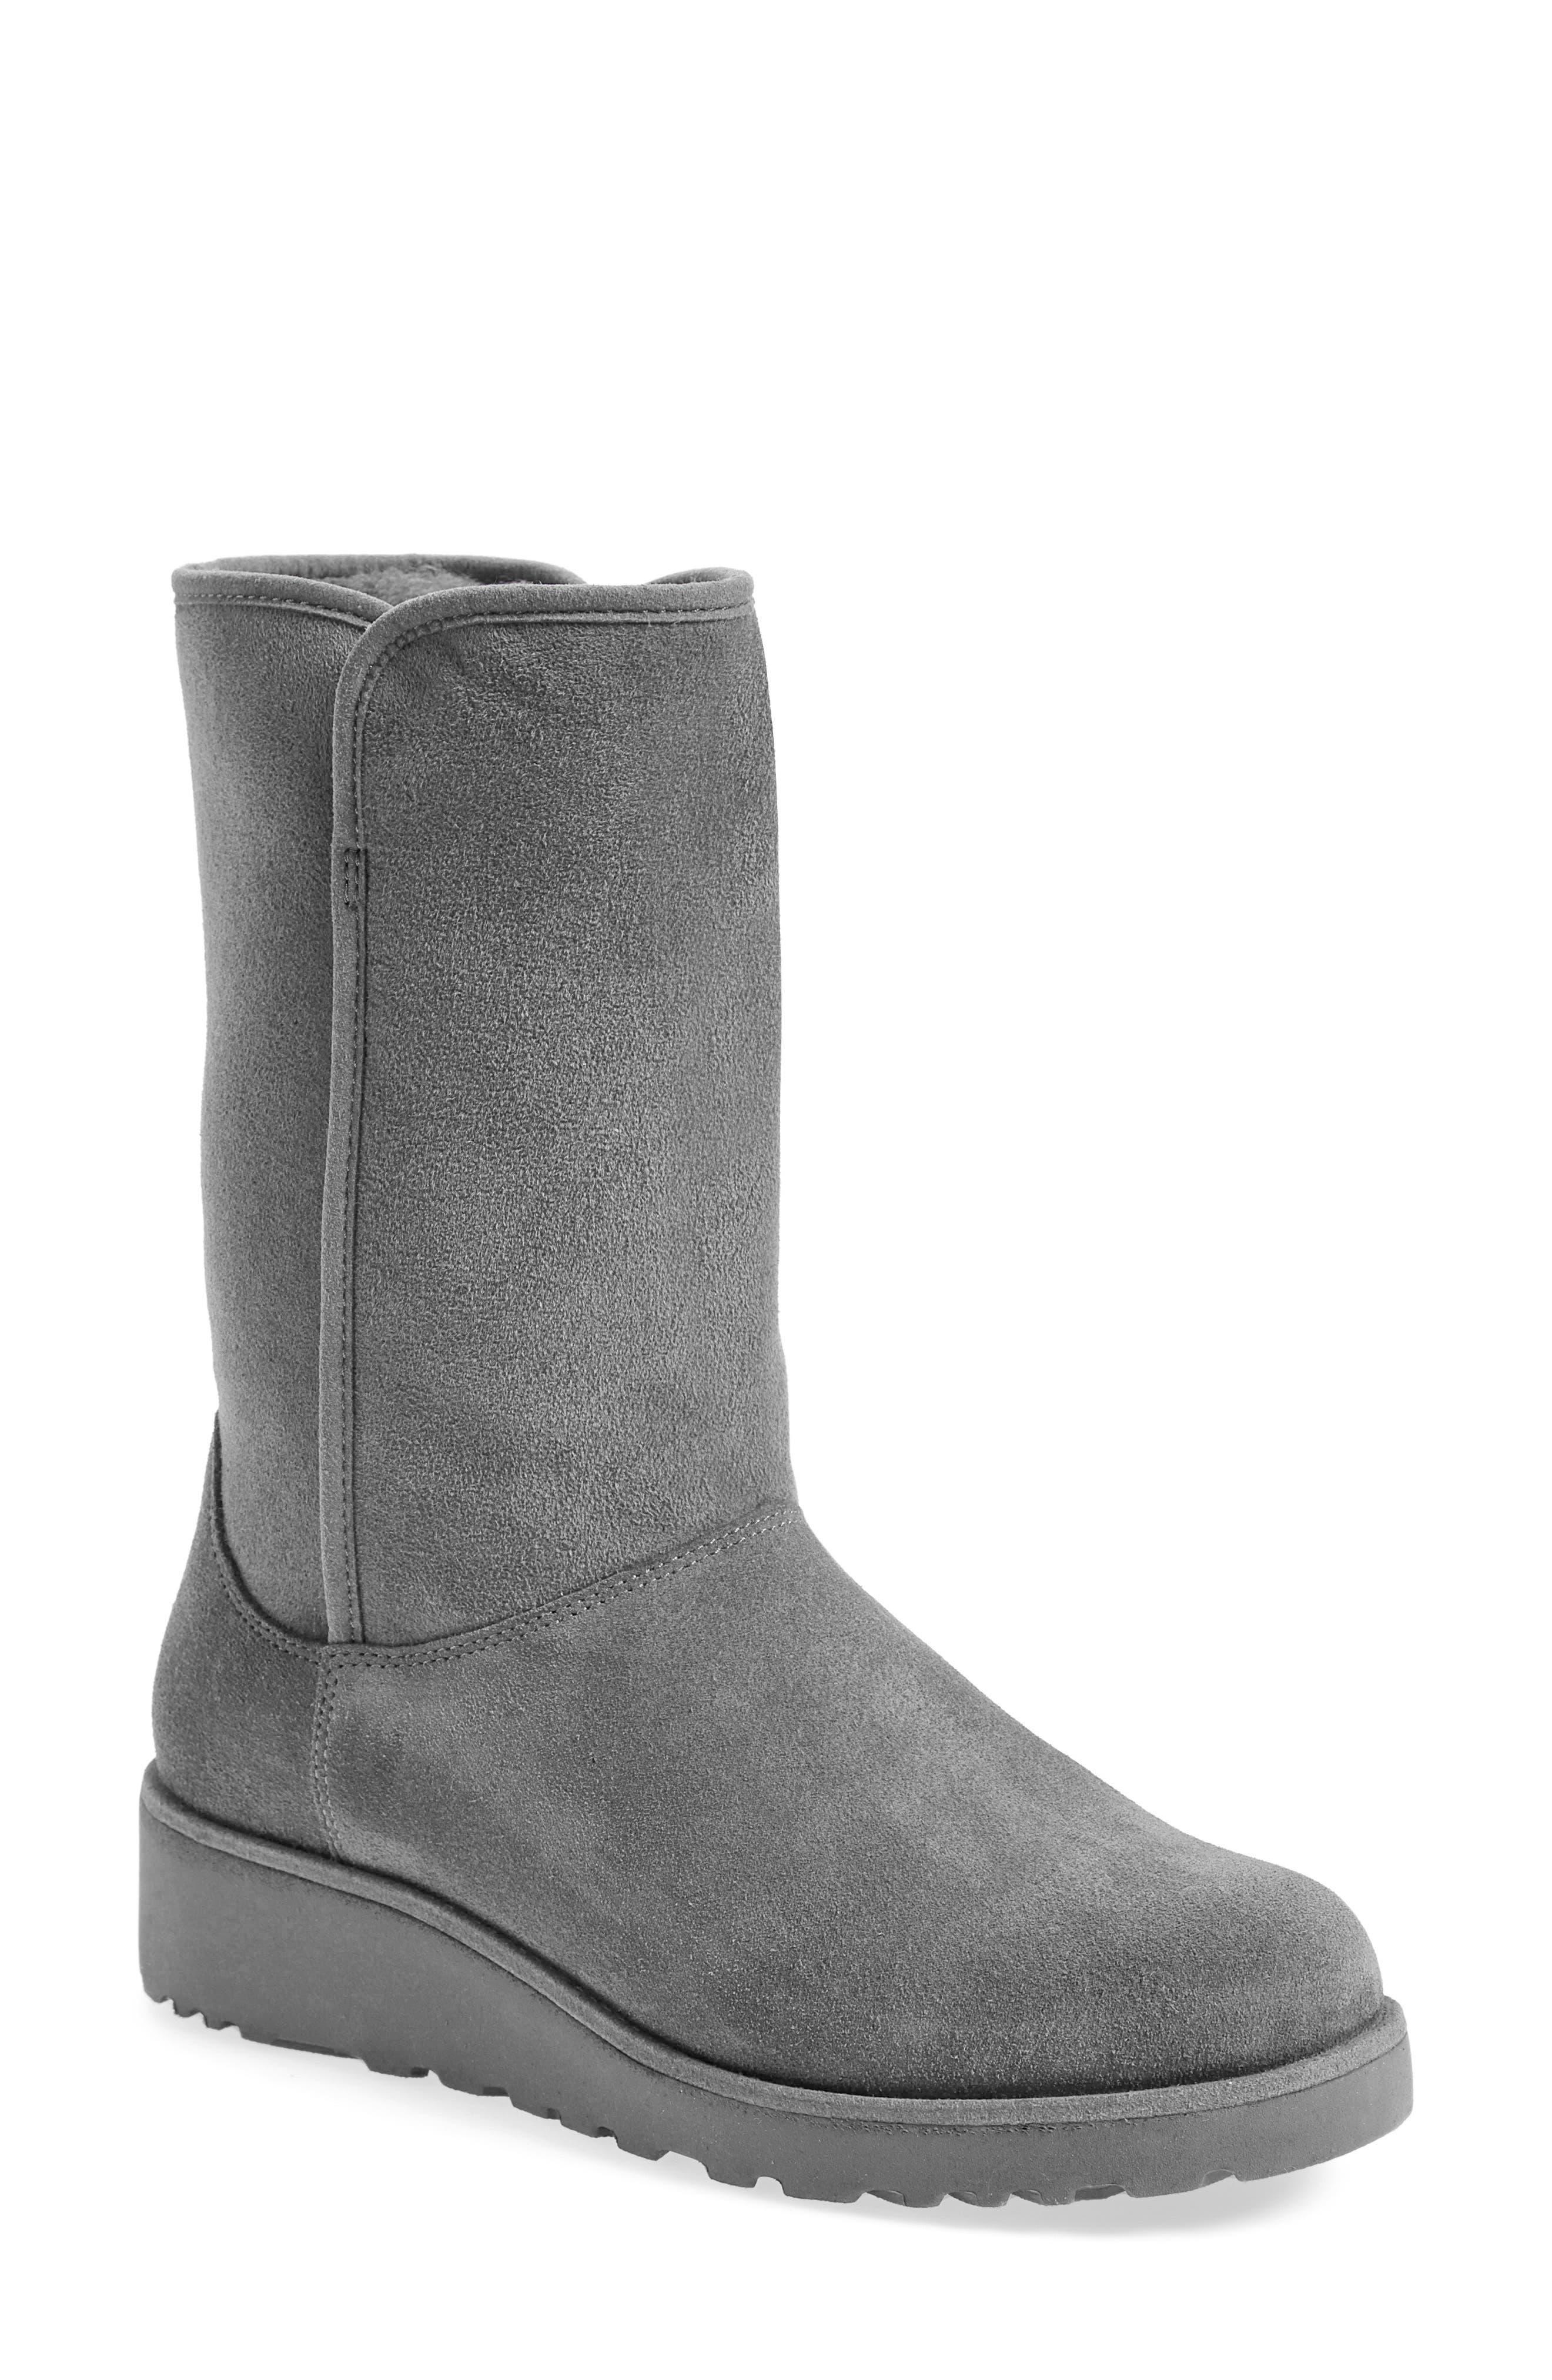 Alternate Image 1 Selected - UGG® Amie - Classic Slim™ Water Resistant Short Boot (Women)